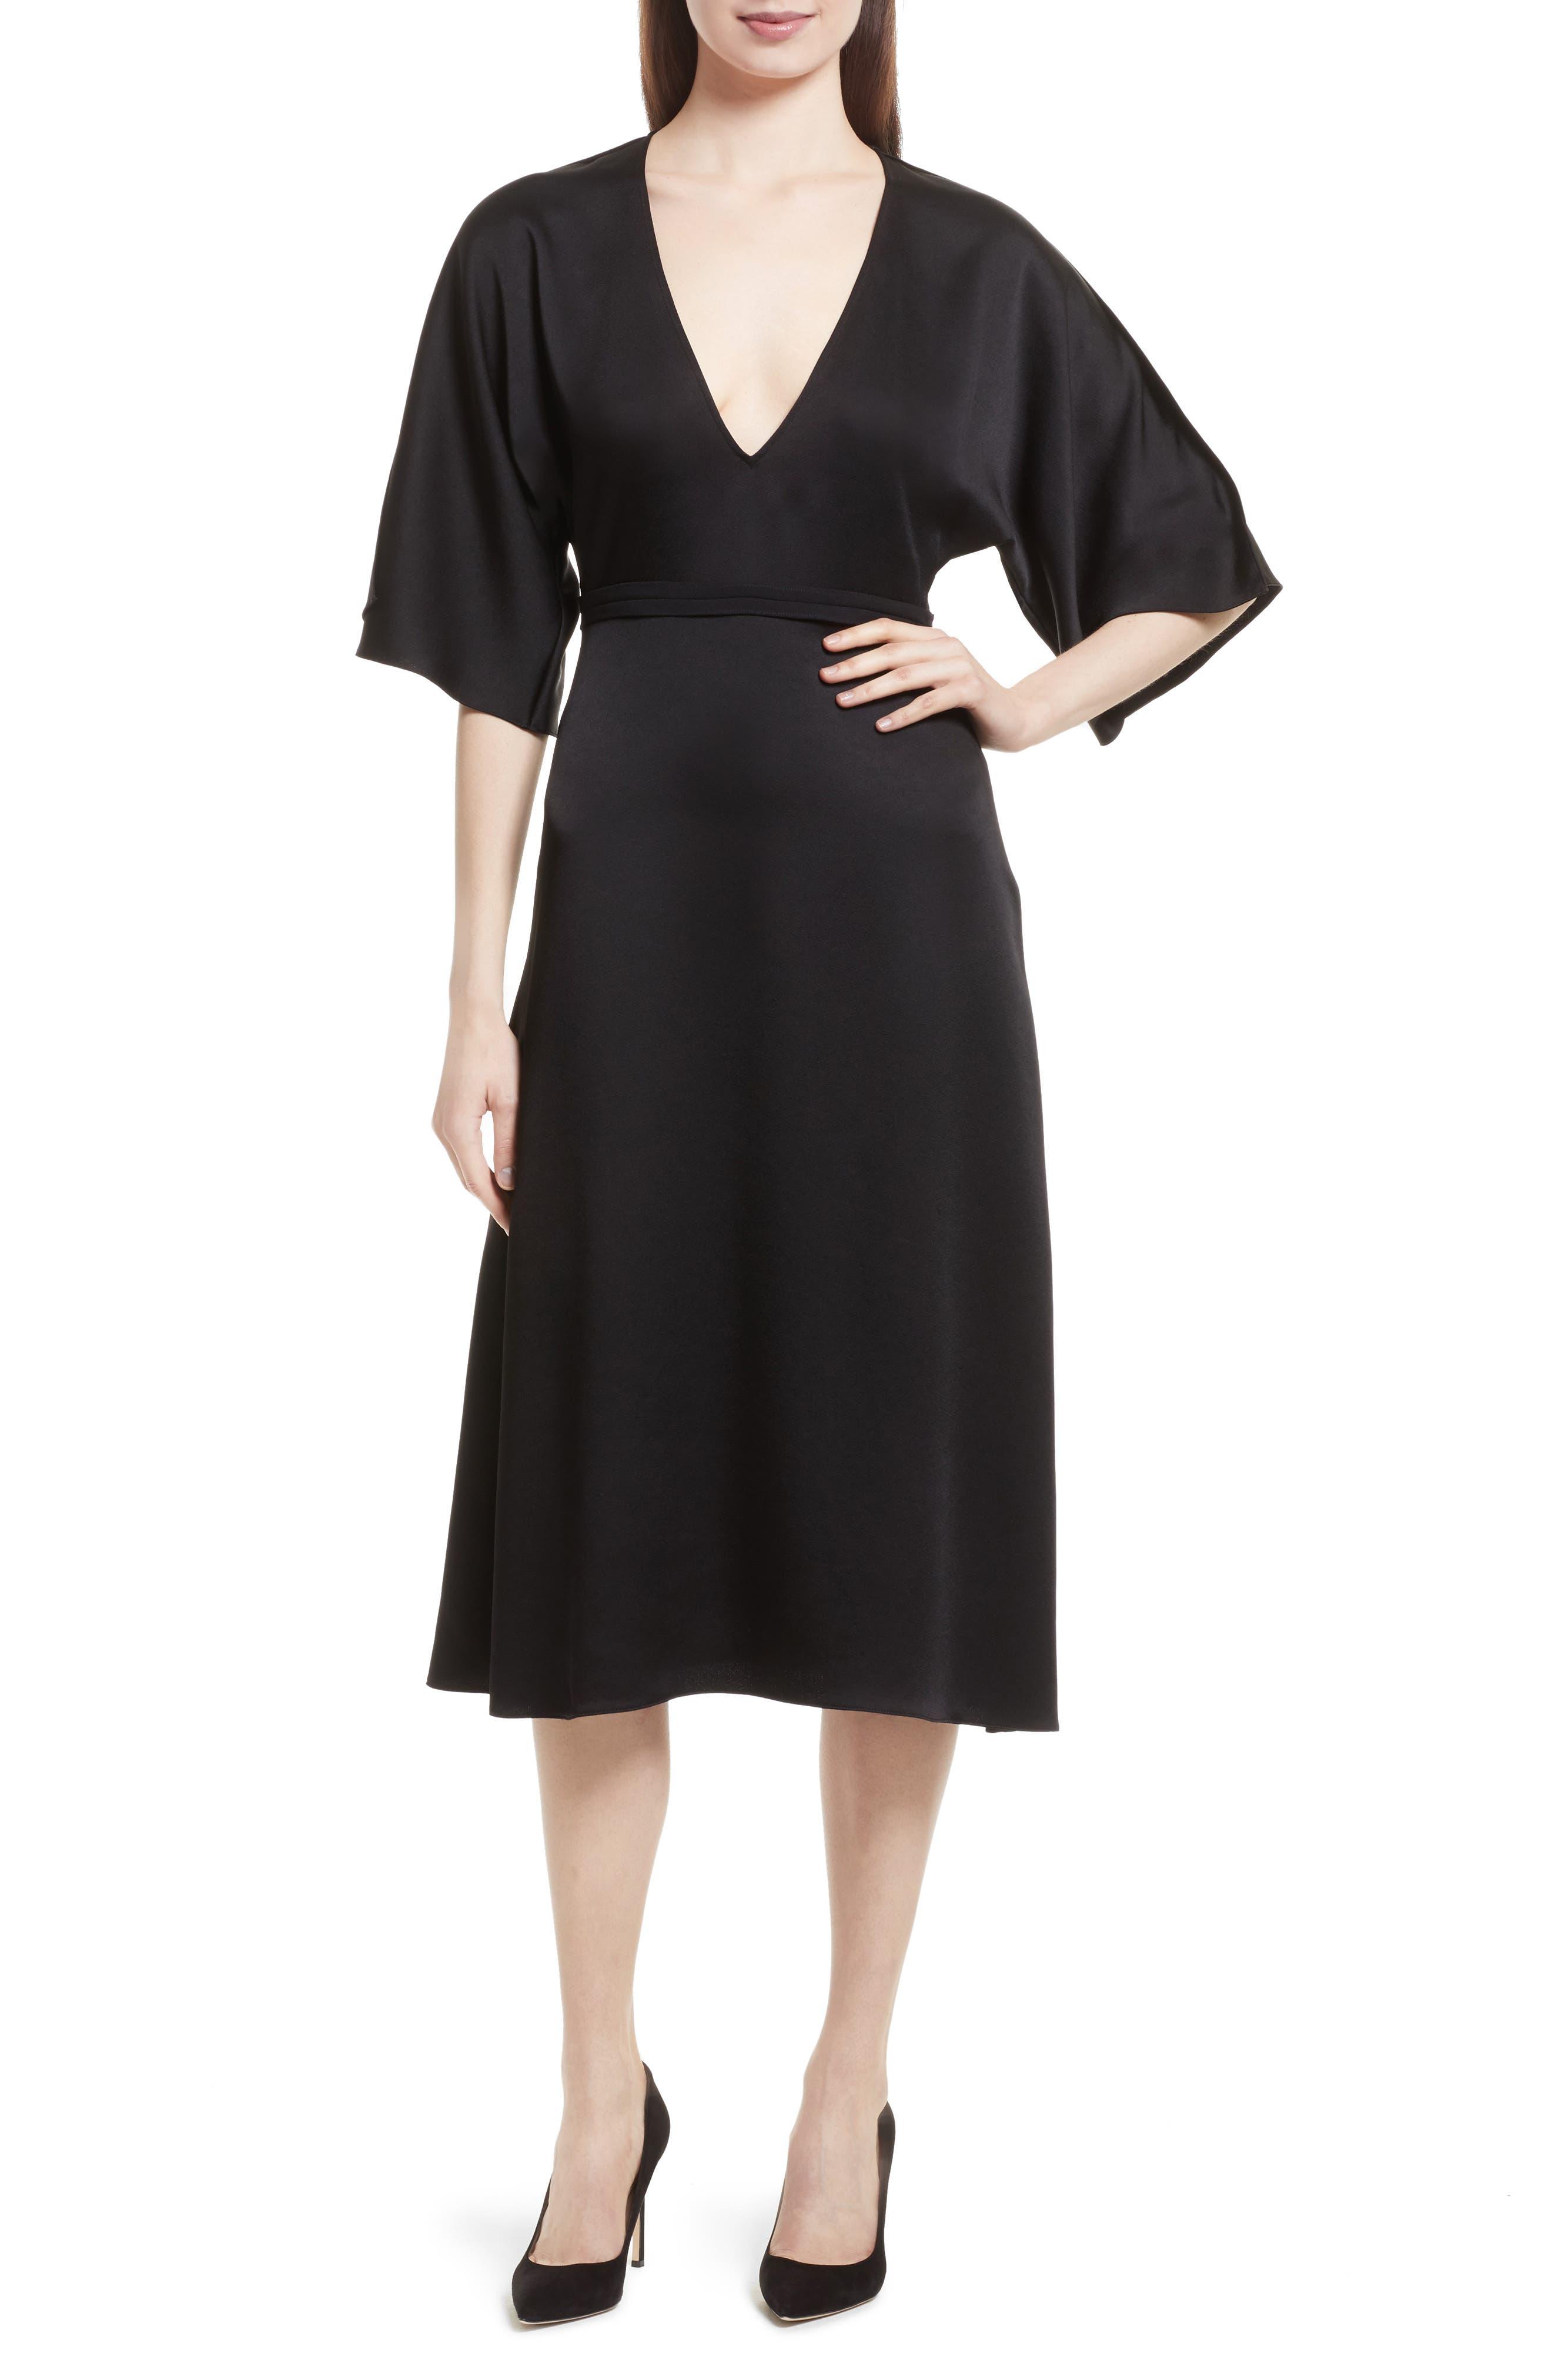 Kensington Midi Dress,                         Main,                         color, 001